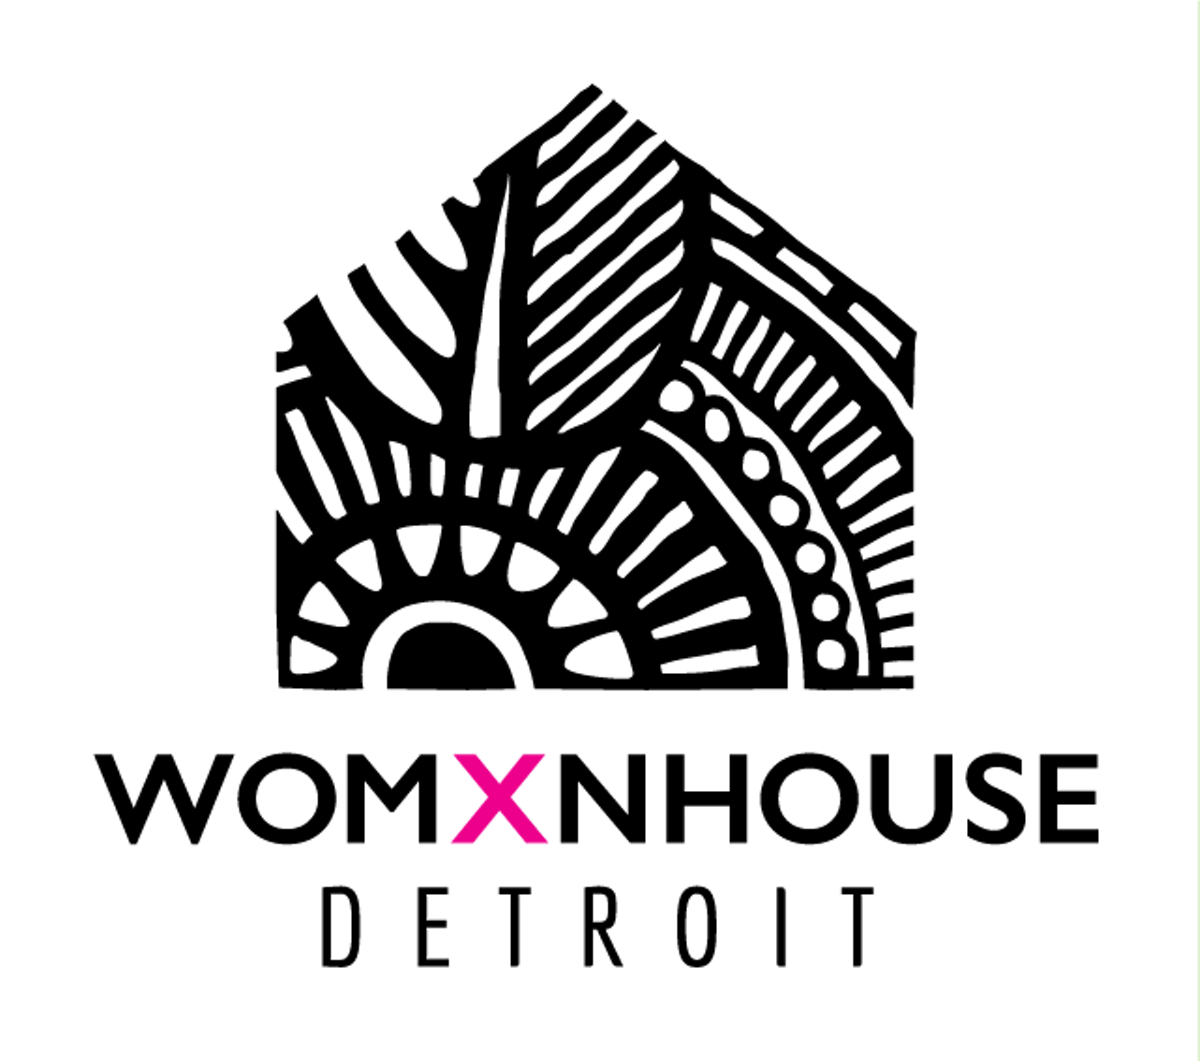 WOMXNHOUSE Detroit opens Sept. 18. Reserve your visit today.